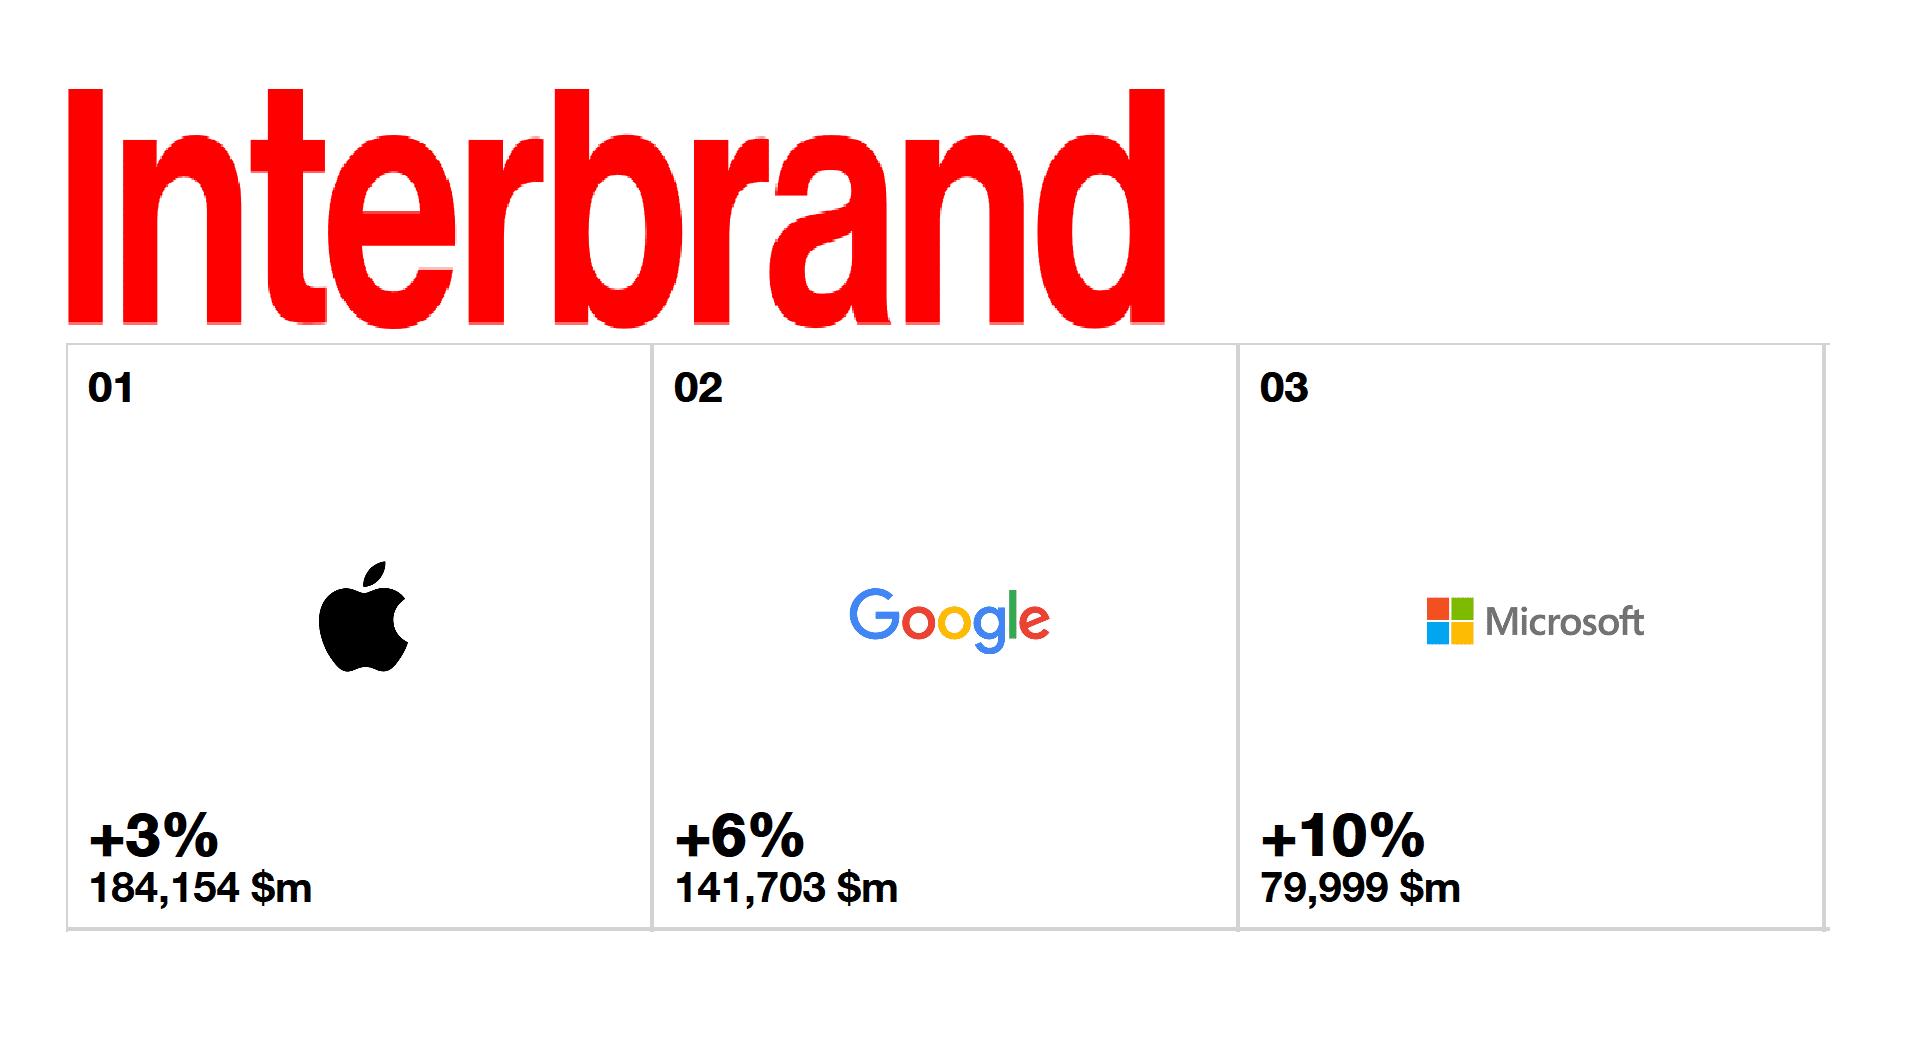 Interbrand Top-3